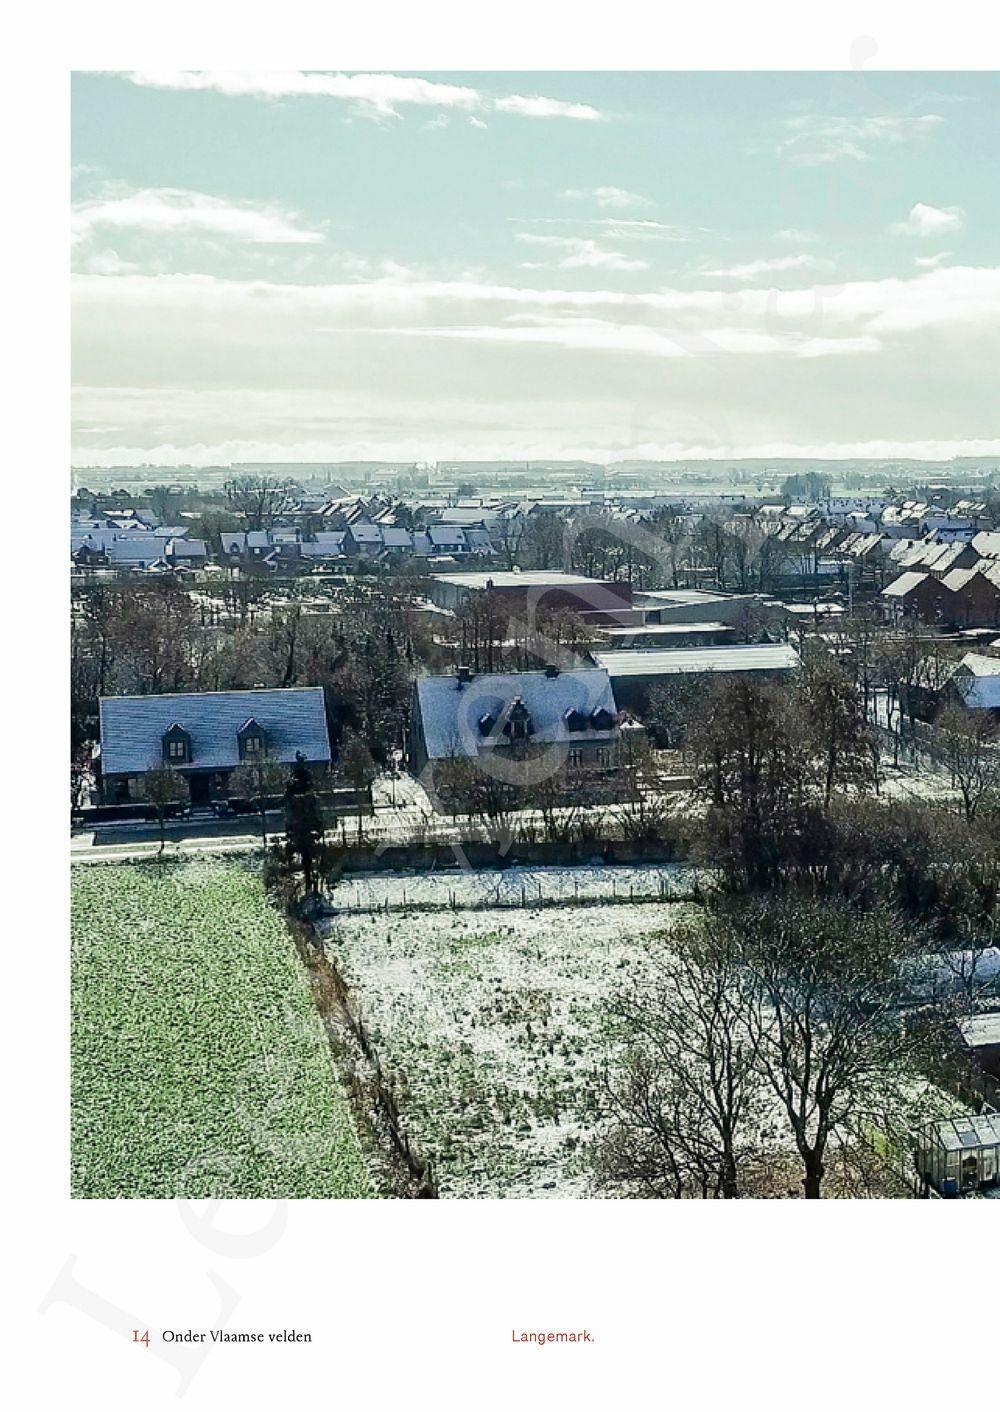 Preview: Onder Vlaamse velden